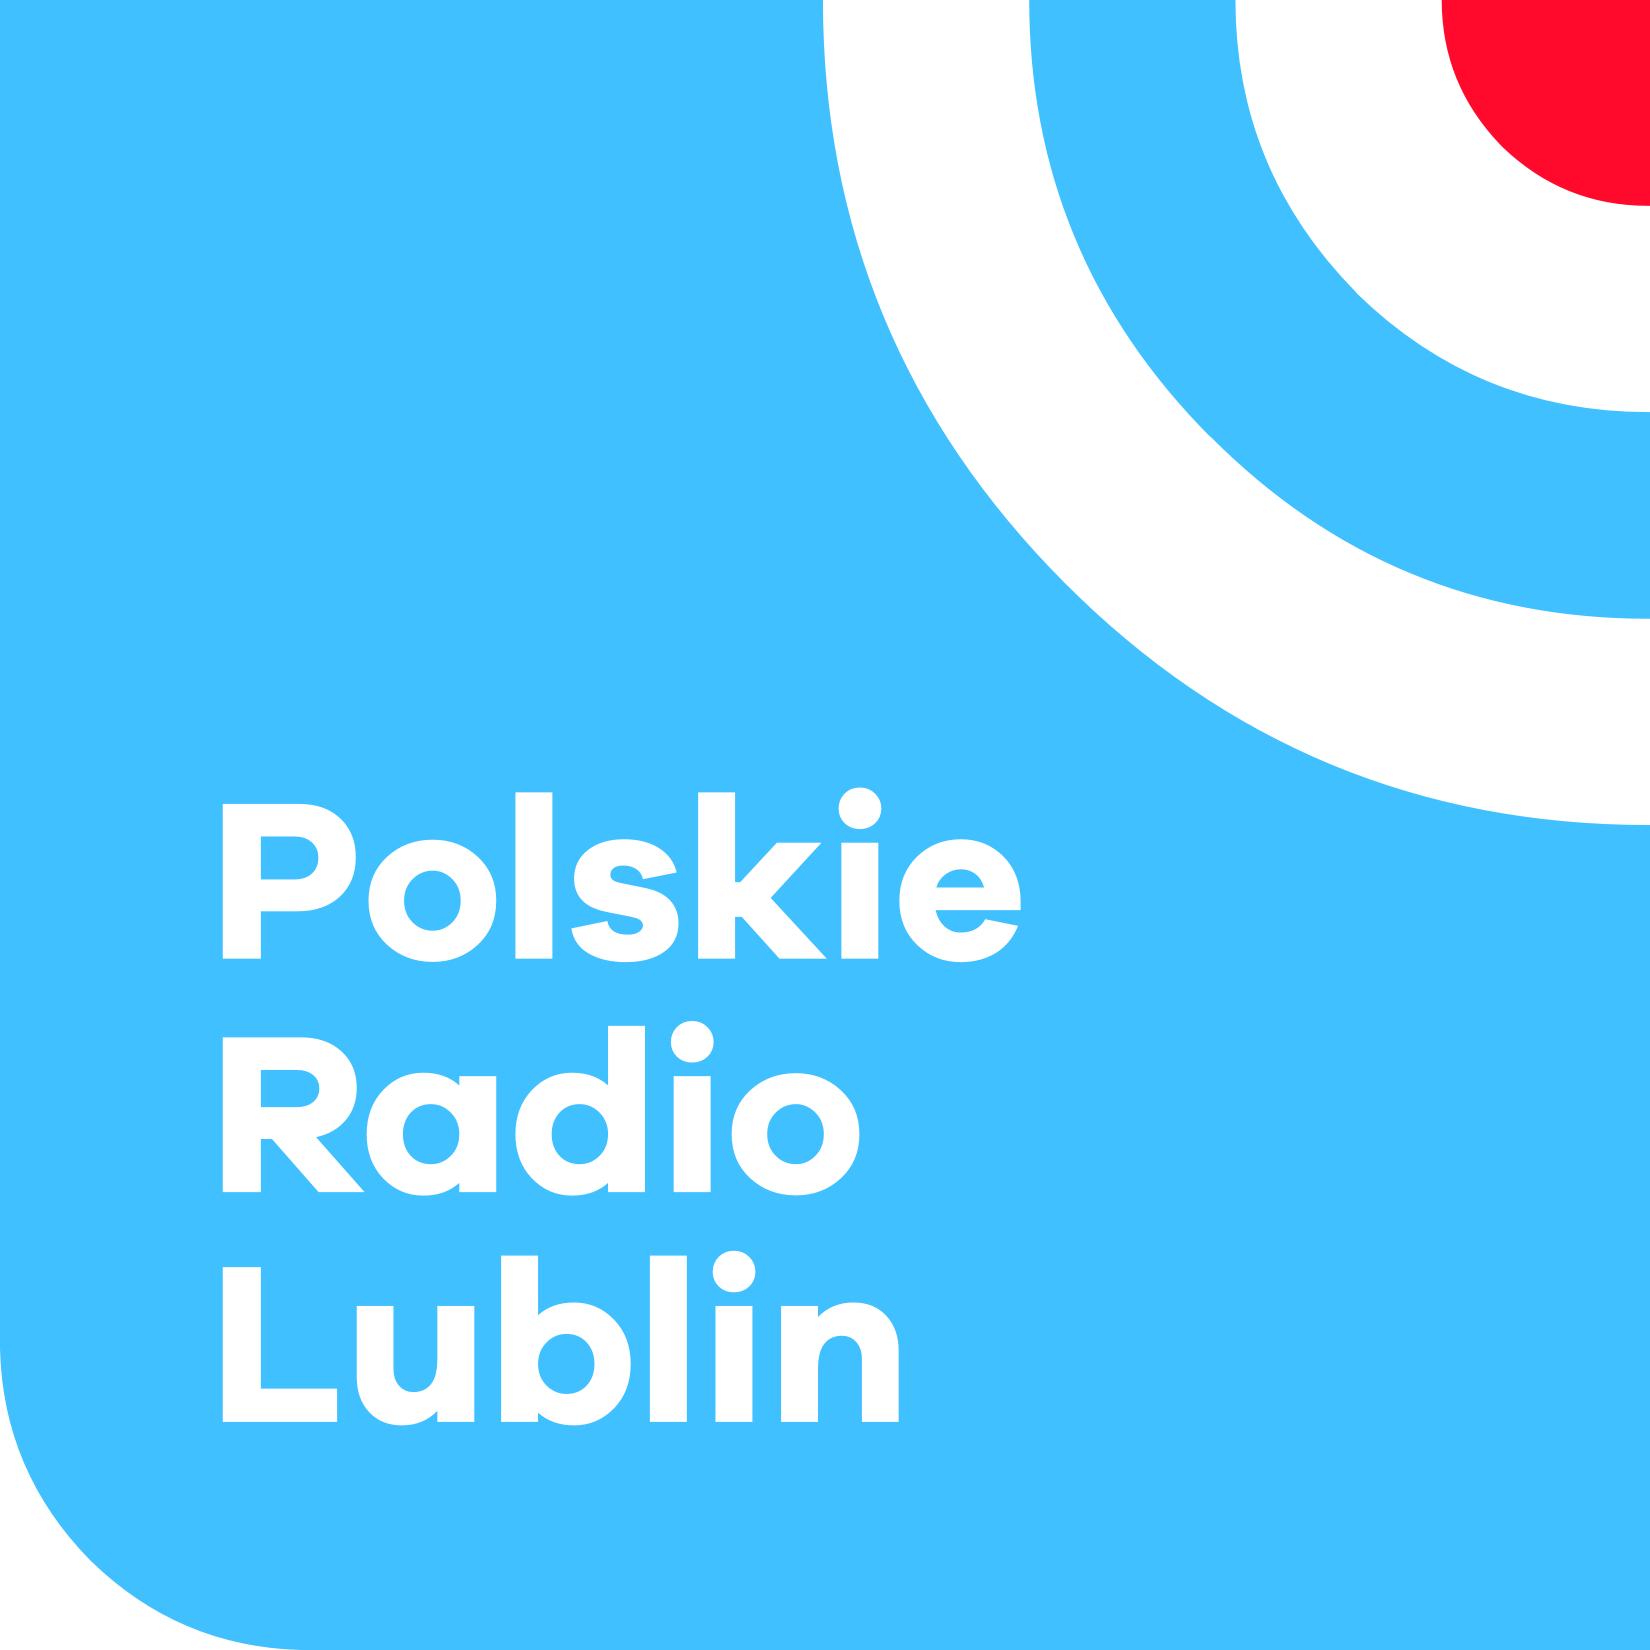 https://radio.lublin.pl/static/logo_rl.png